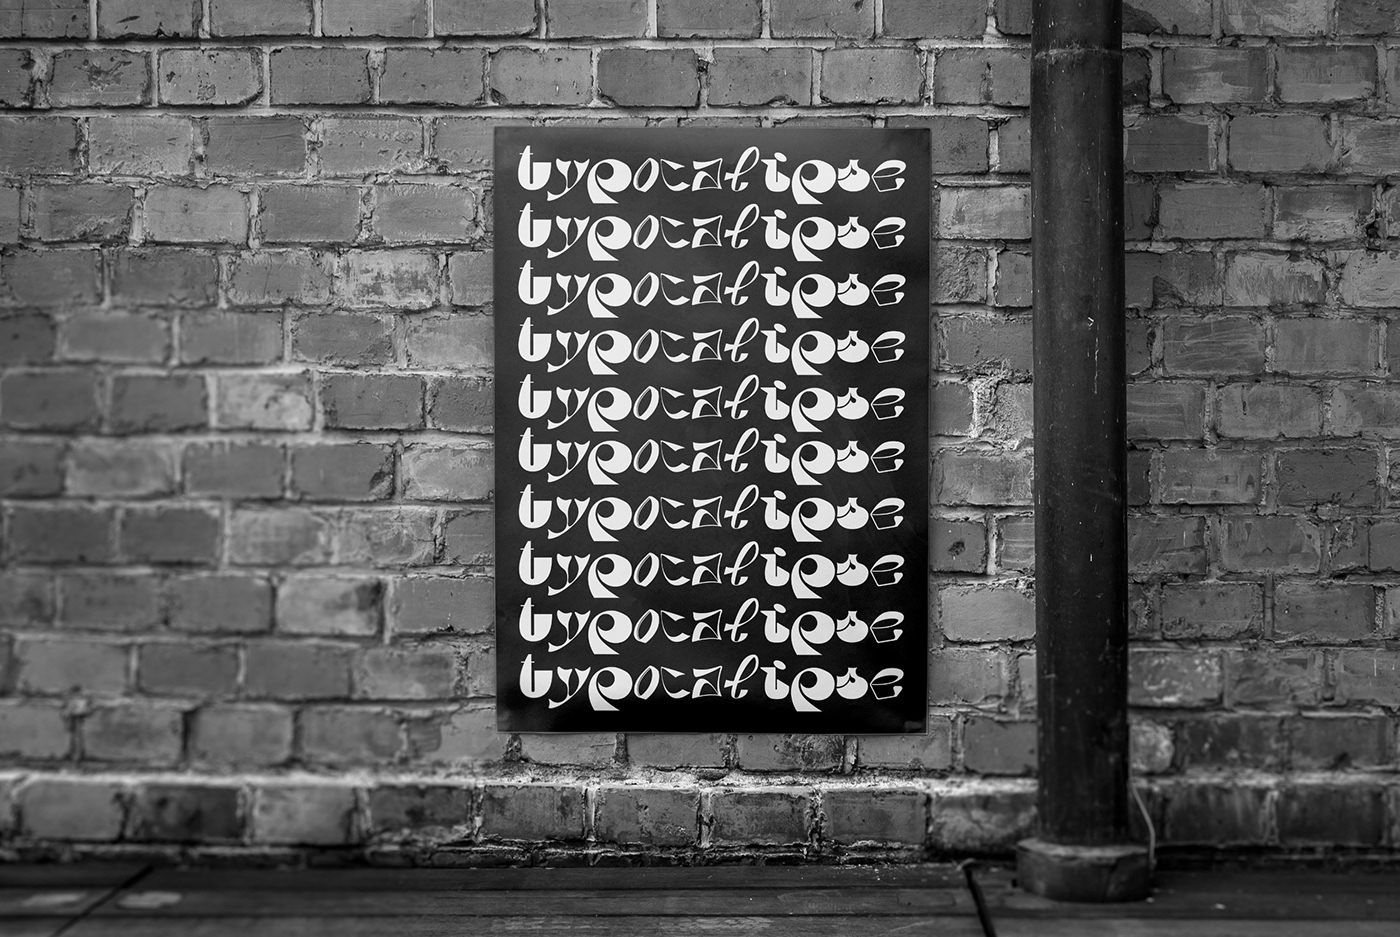 #36daysoftype07 #alphabet #fontdesign #graphicDesign #letterdesign #lettering #type #typedesign #typo #typography